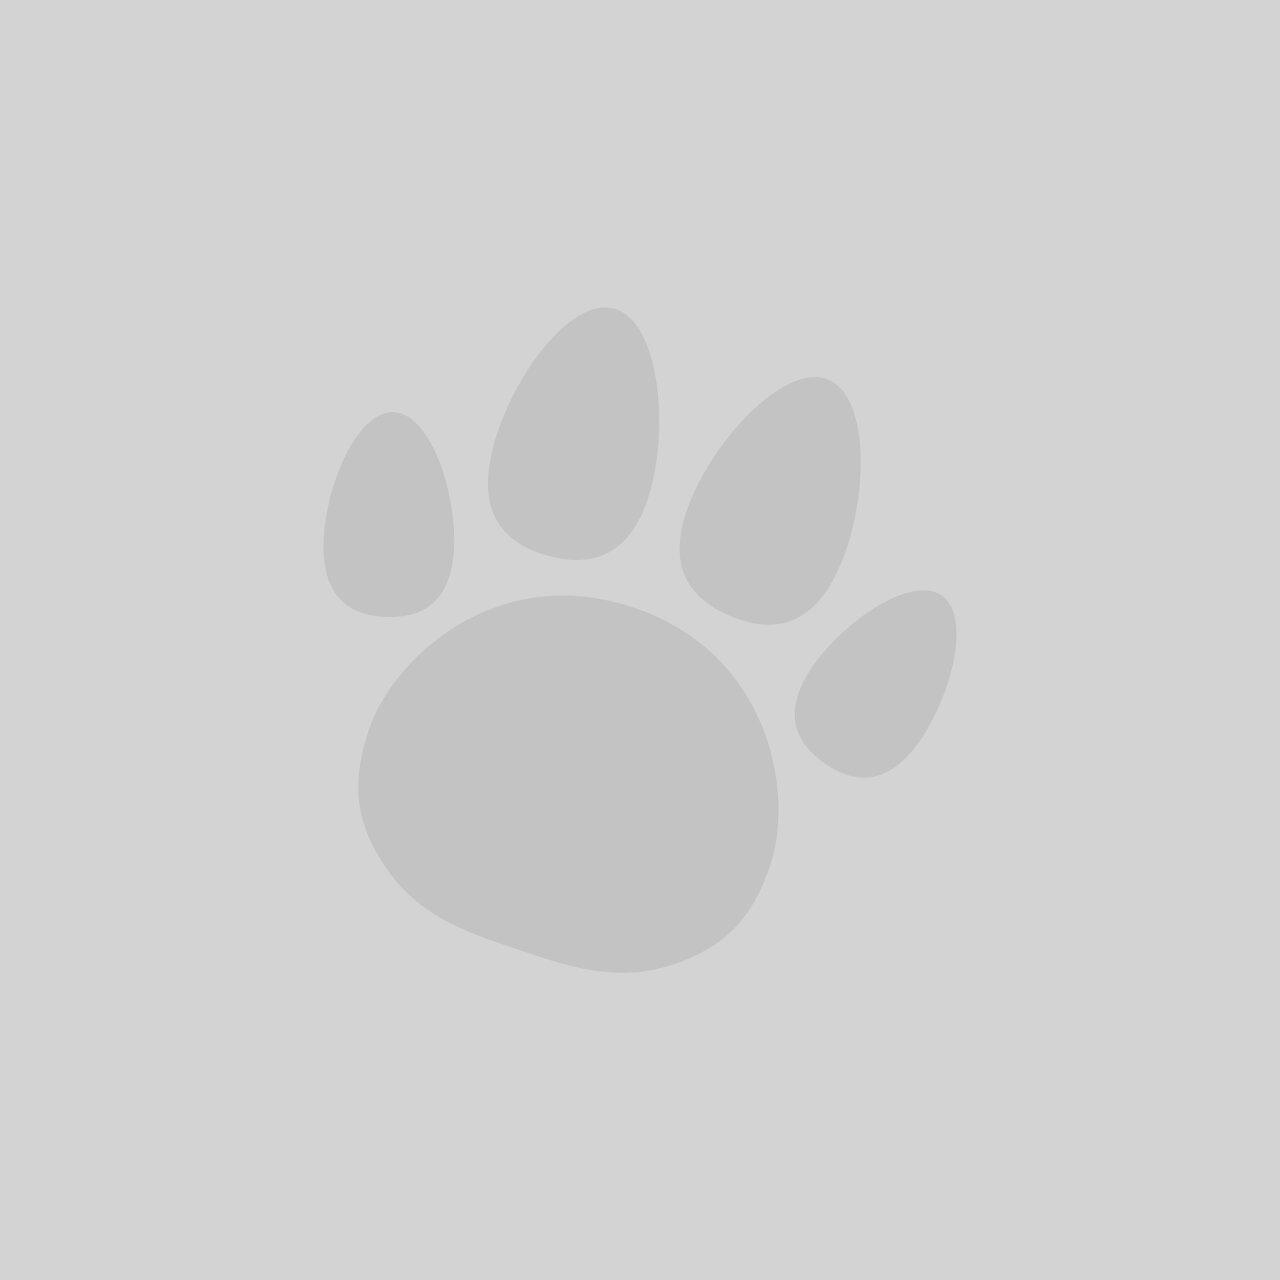 Johnson's Vit-Min Drops For Small Animals 100ml